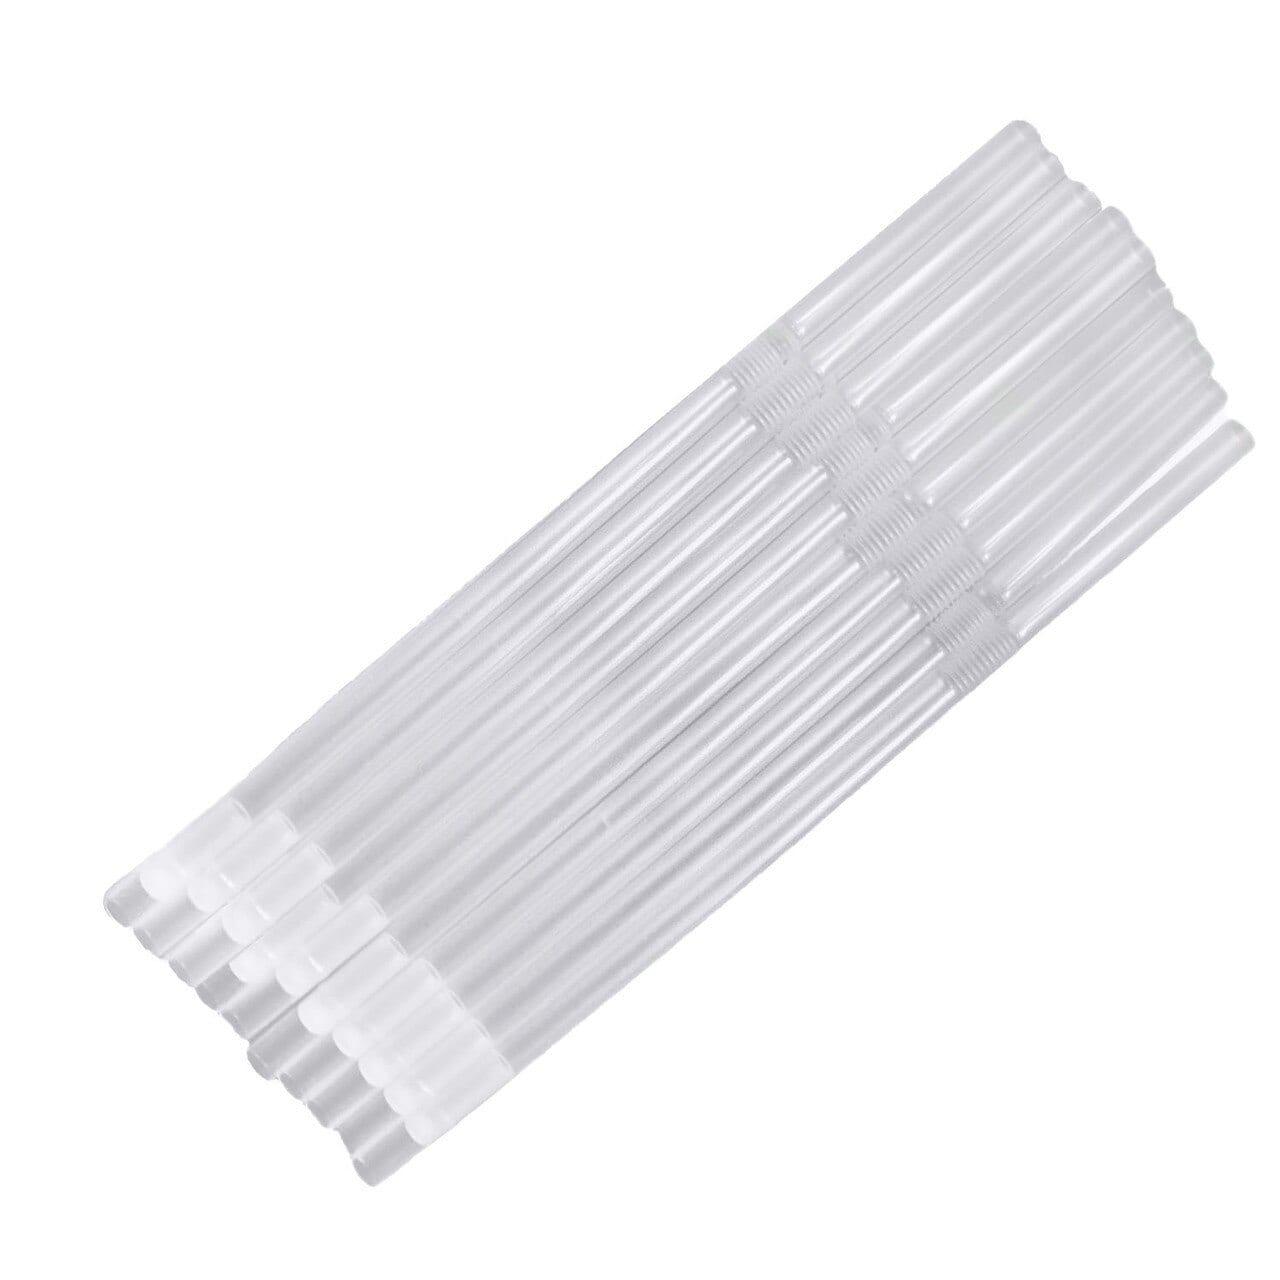 Ark's One-Way Straws - 10 Pack